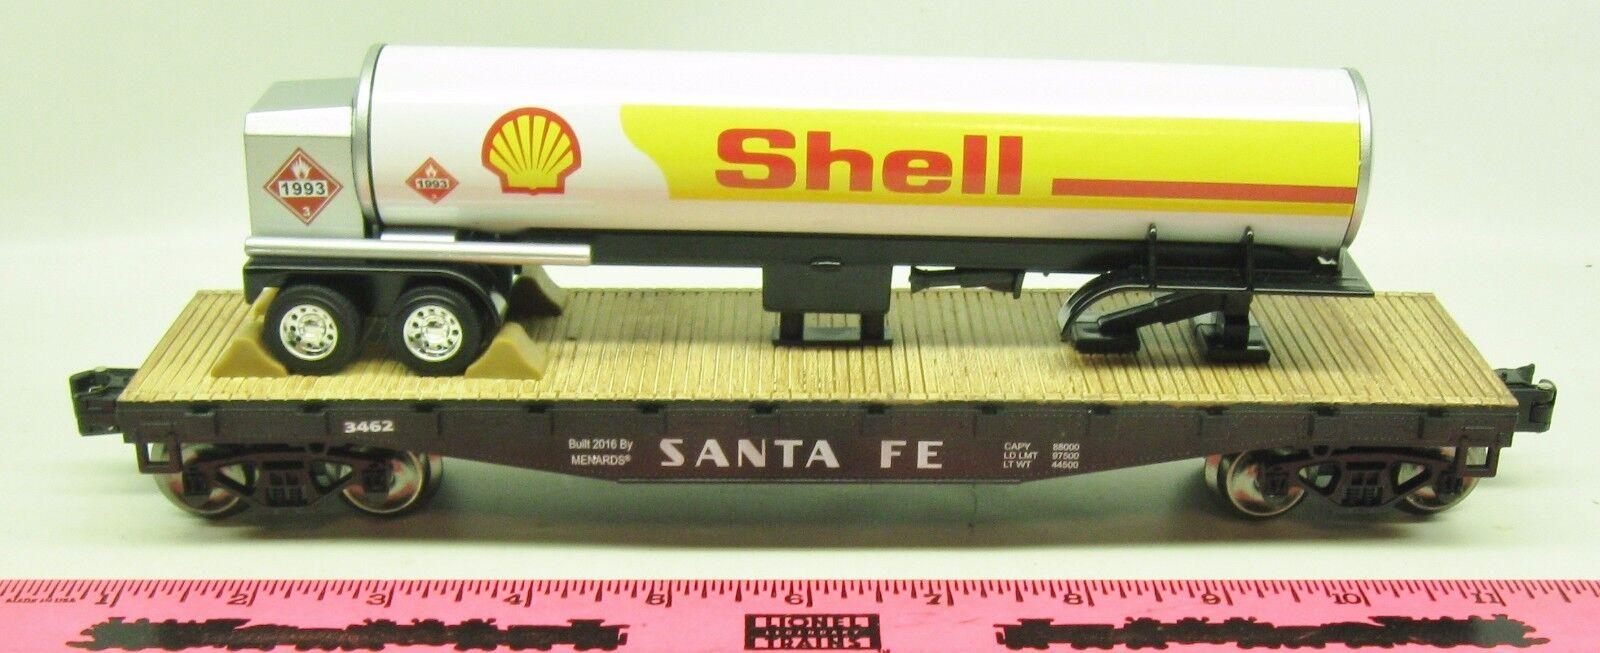 Menards  Santa Fe flatcar with Shell trailer tanker NEW 2016